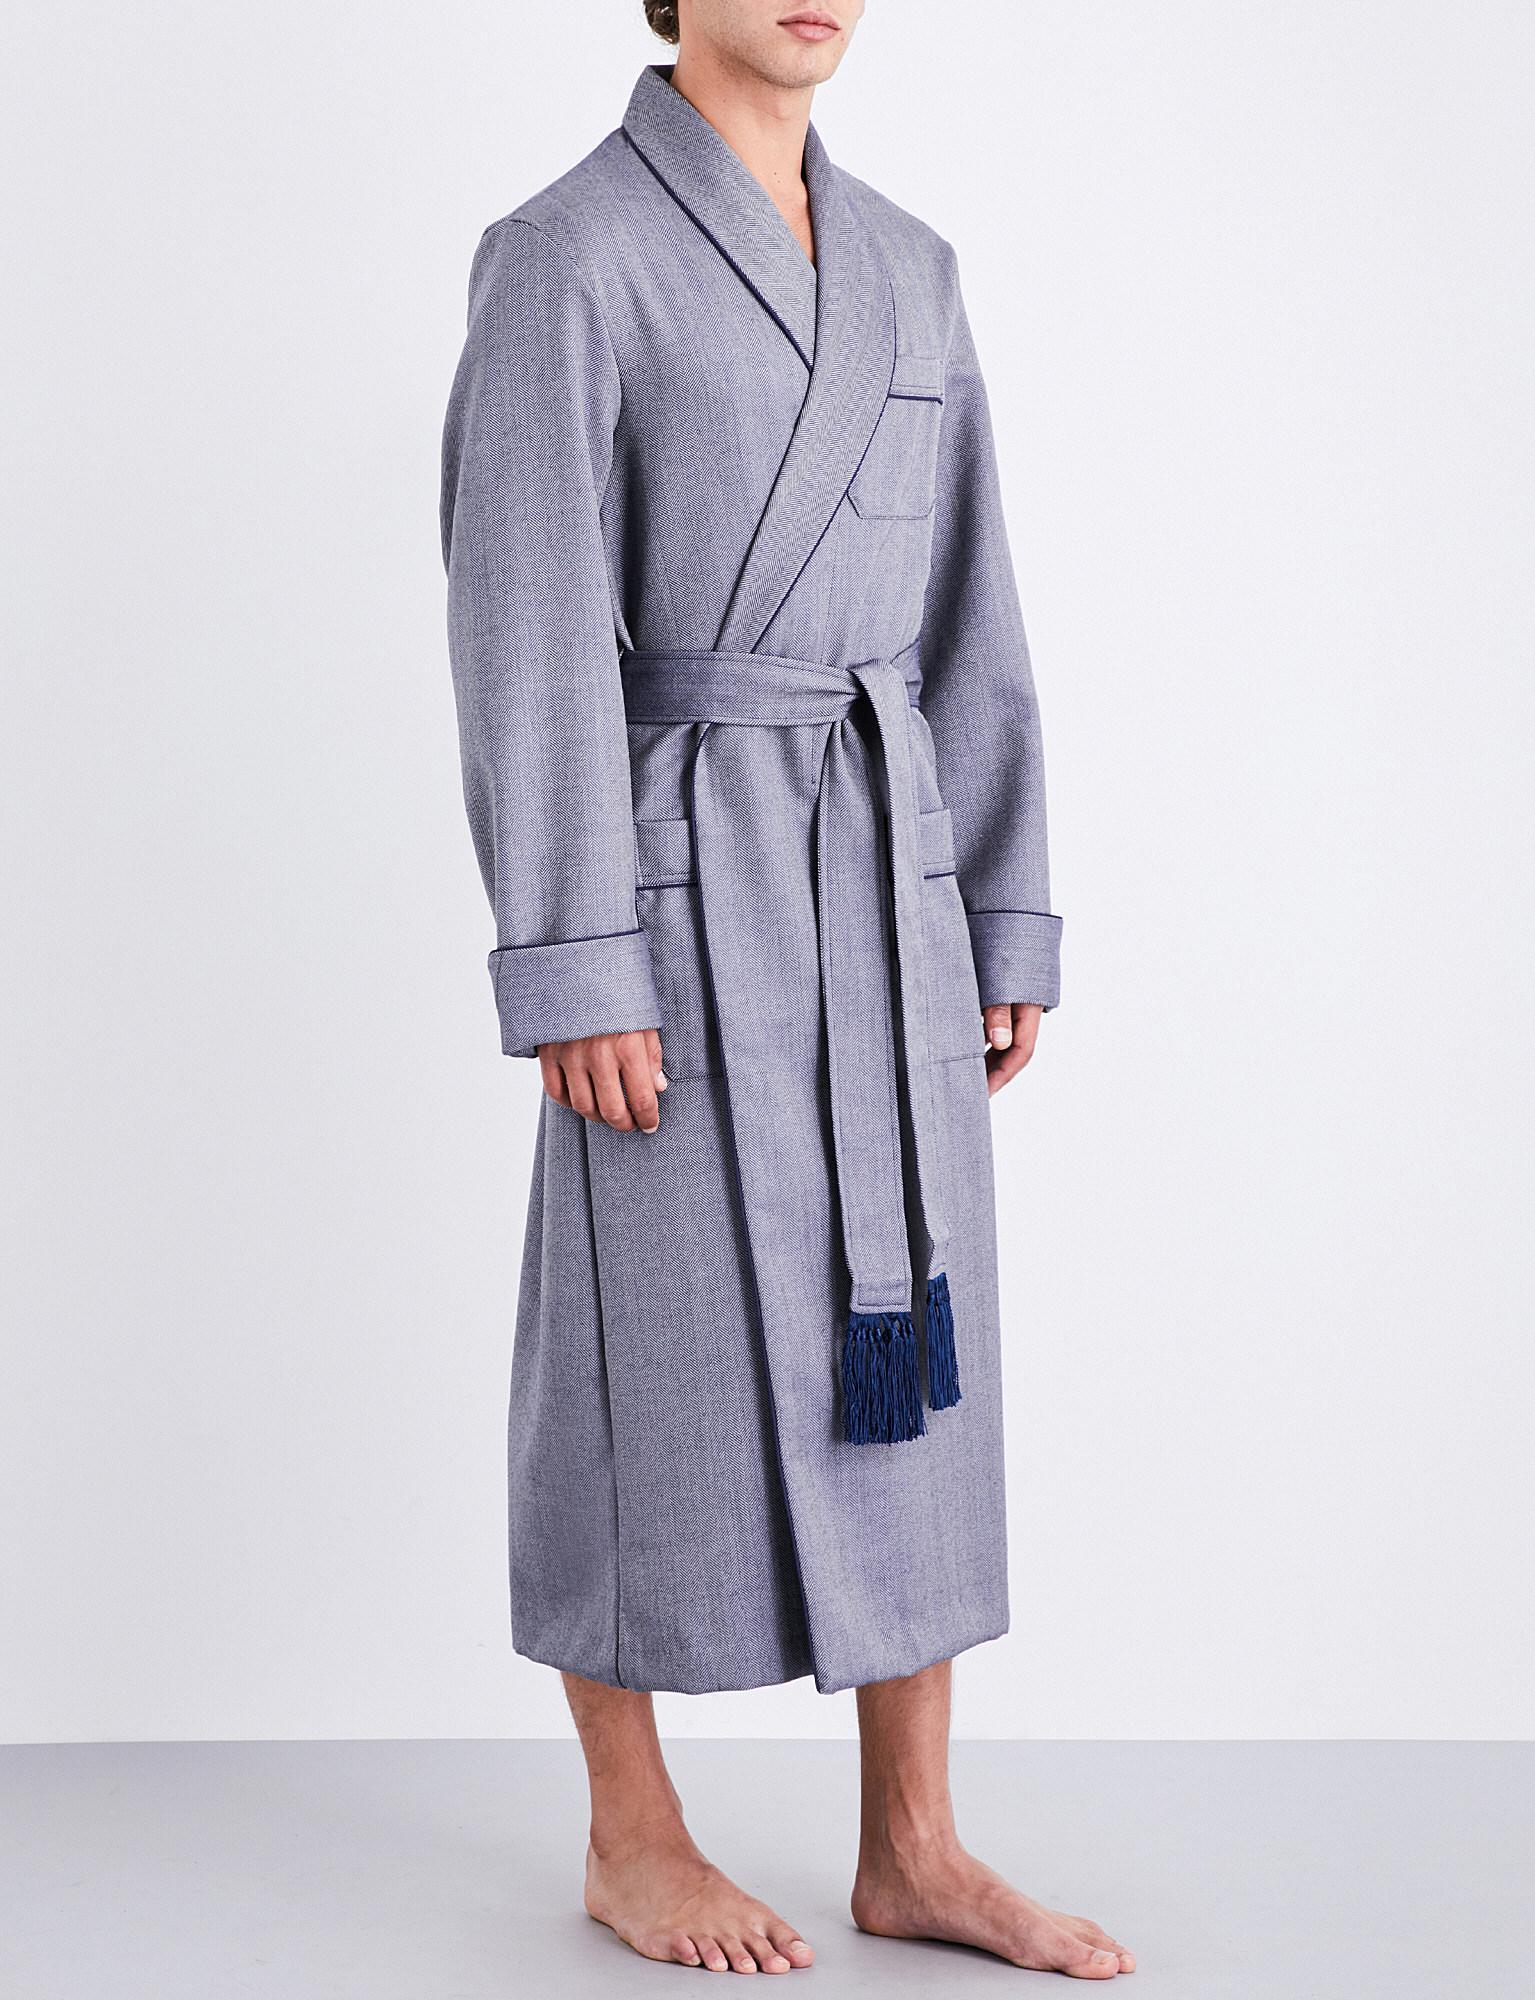 78f611867f Lyst - Derek Rose Lincoln Herringbone Wool Dressing Gown in Blue for Men